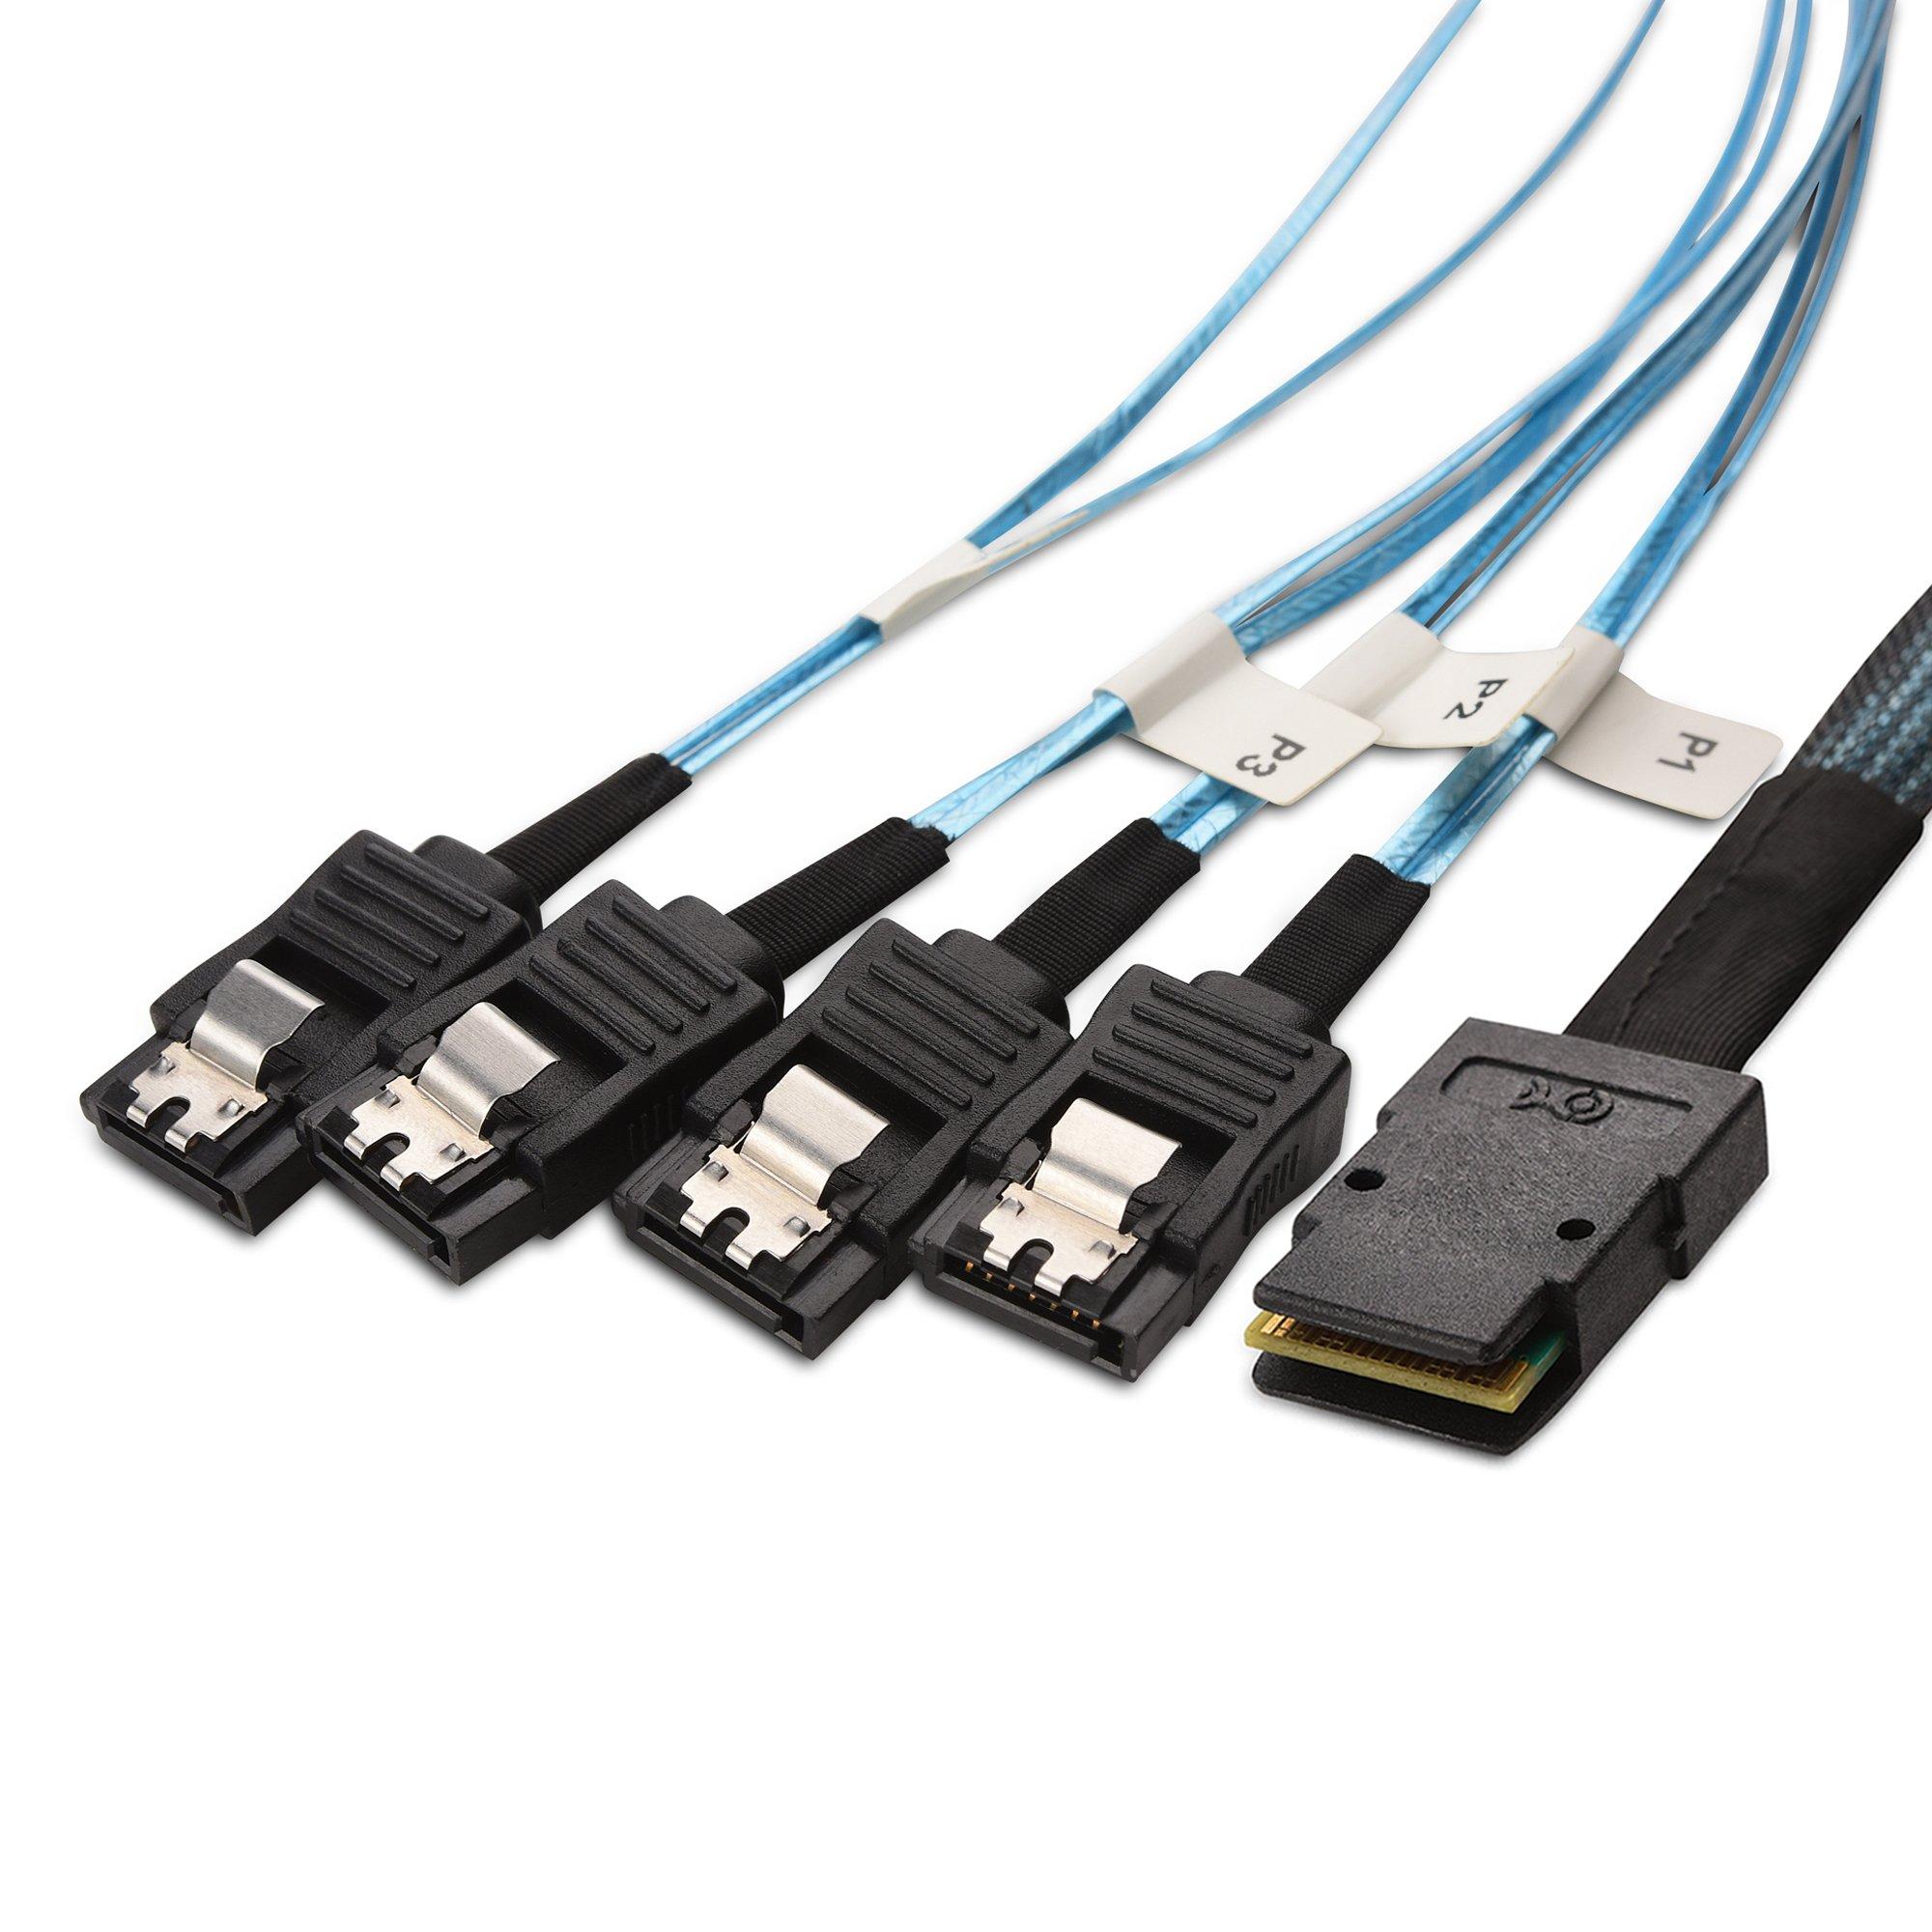 Cable Matters Internal Mini Sas To 4x Sata Forward